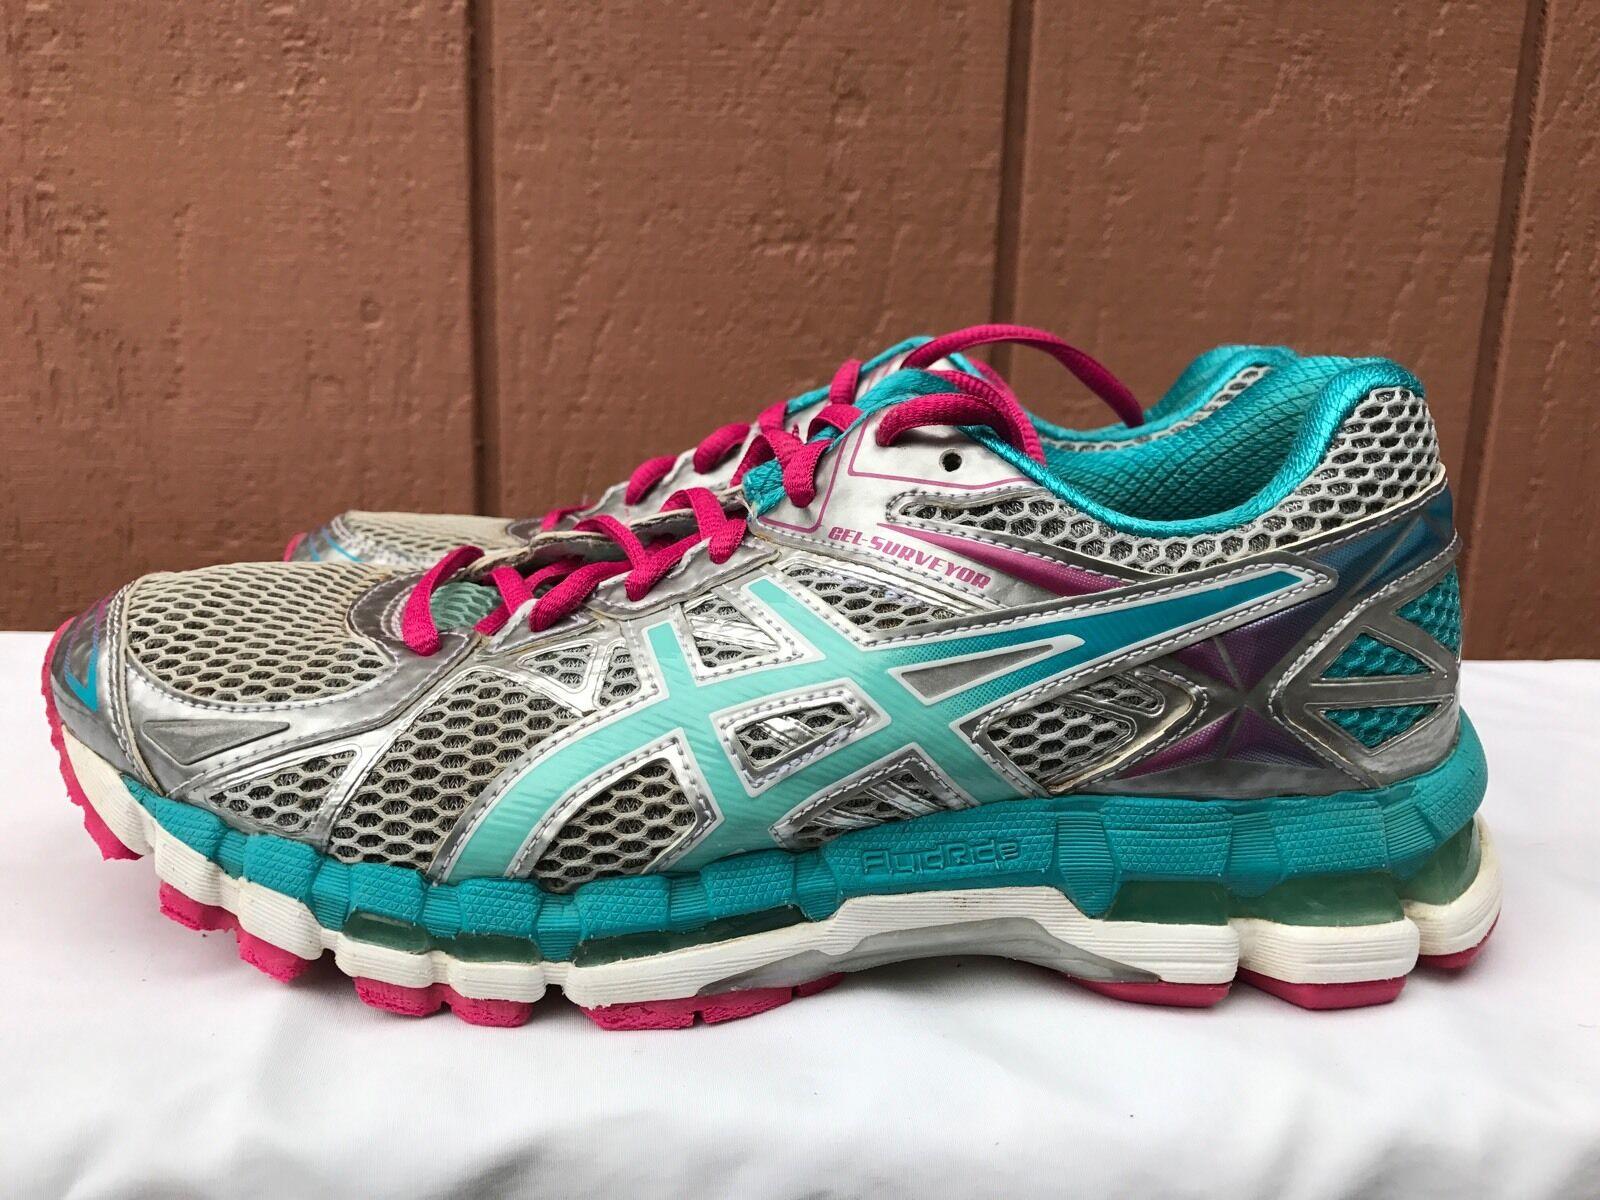 EUC Asics Gel-Surveyor Silver Blue Pink Womens US 8.5 Running Shoes T564N